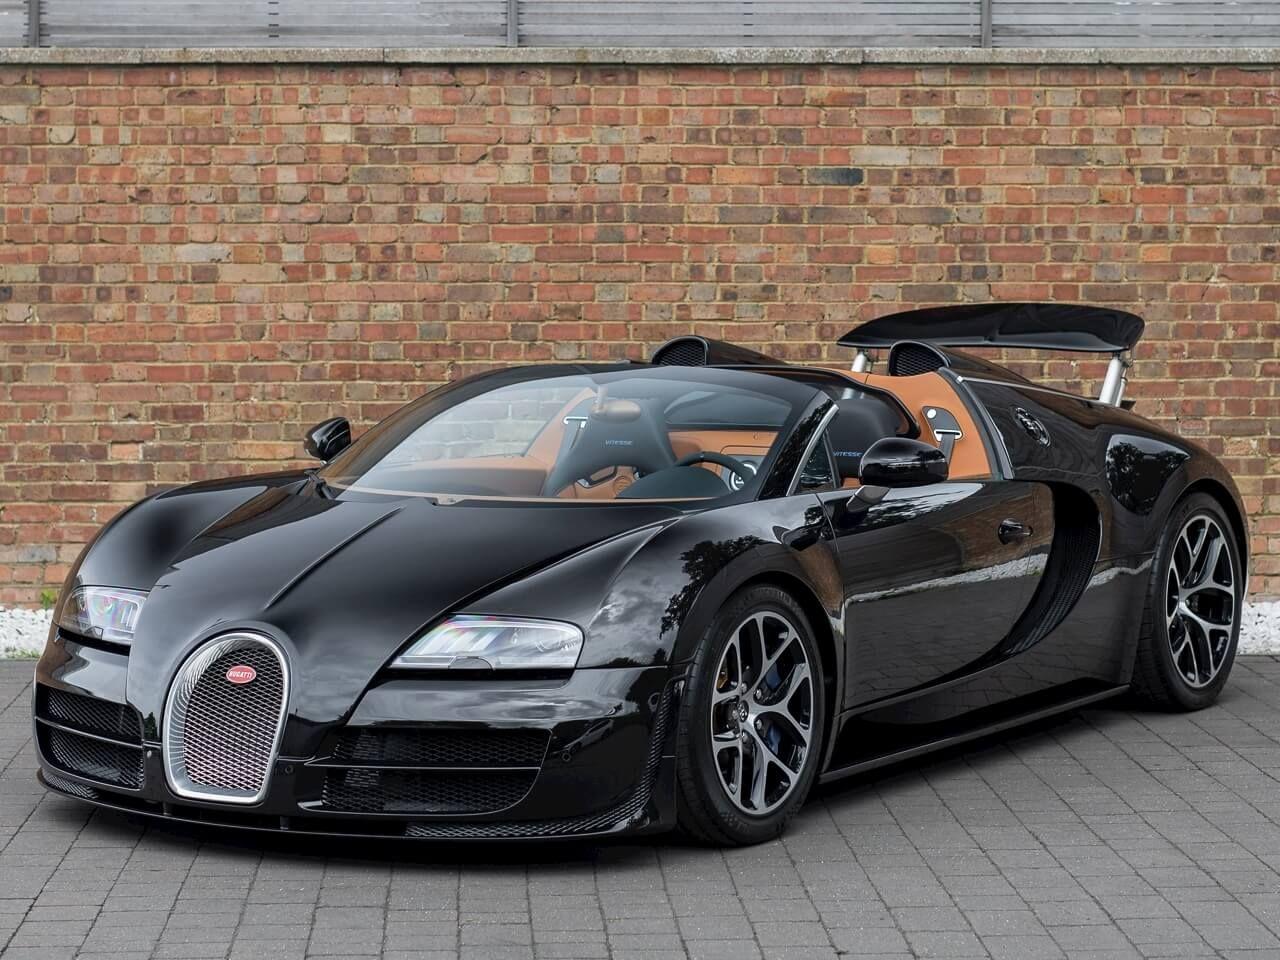 Bugatti Veyron 16 4 Grand Sport Vitesse In 2021 Bugatti Veyron Grand Sport Vitesse Bugatti Veyron 16 Bugatti Veyron